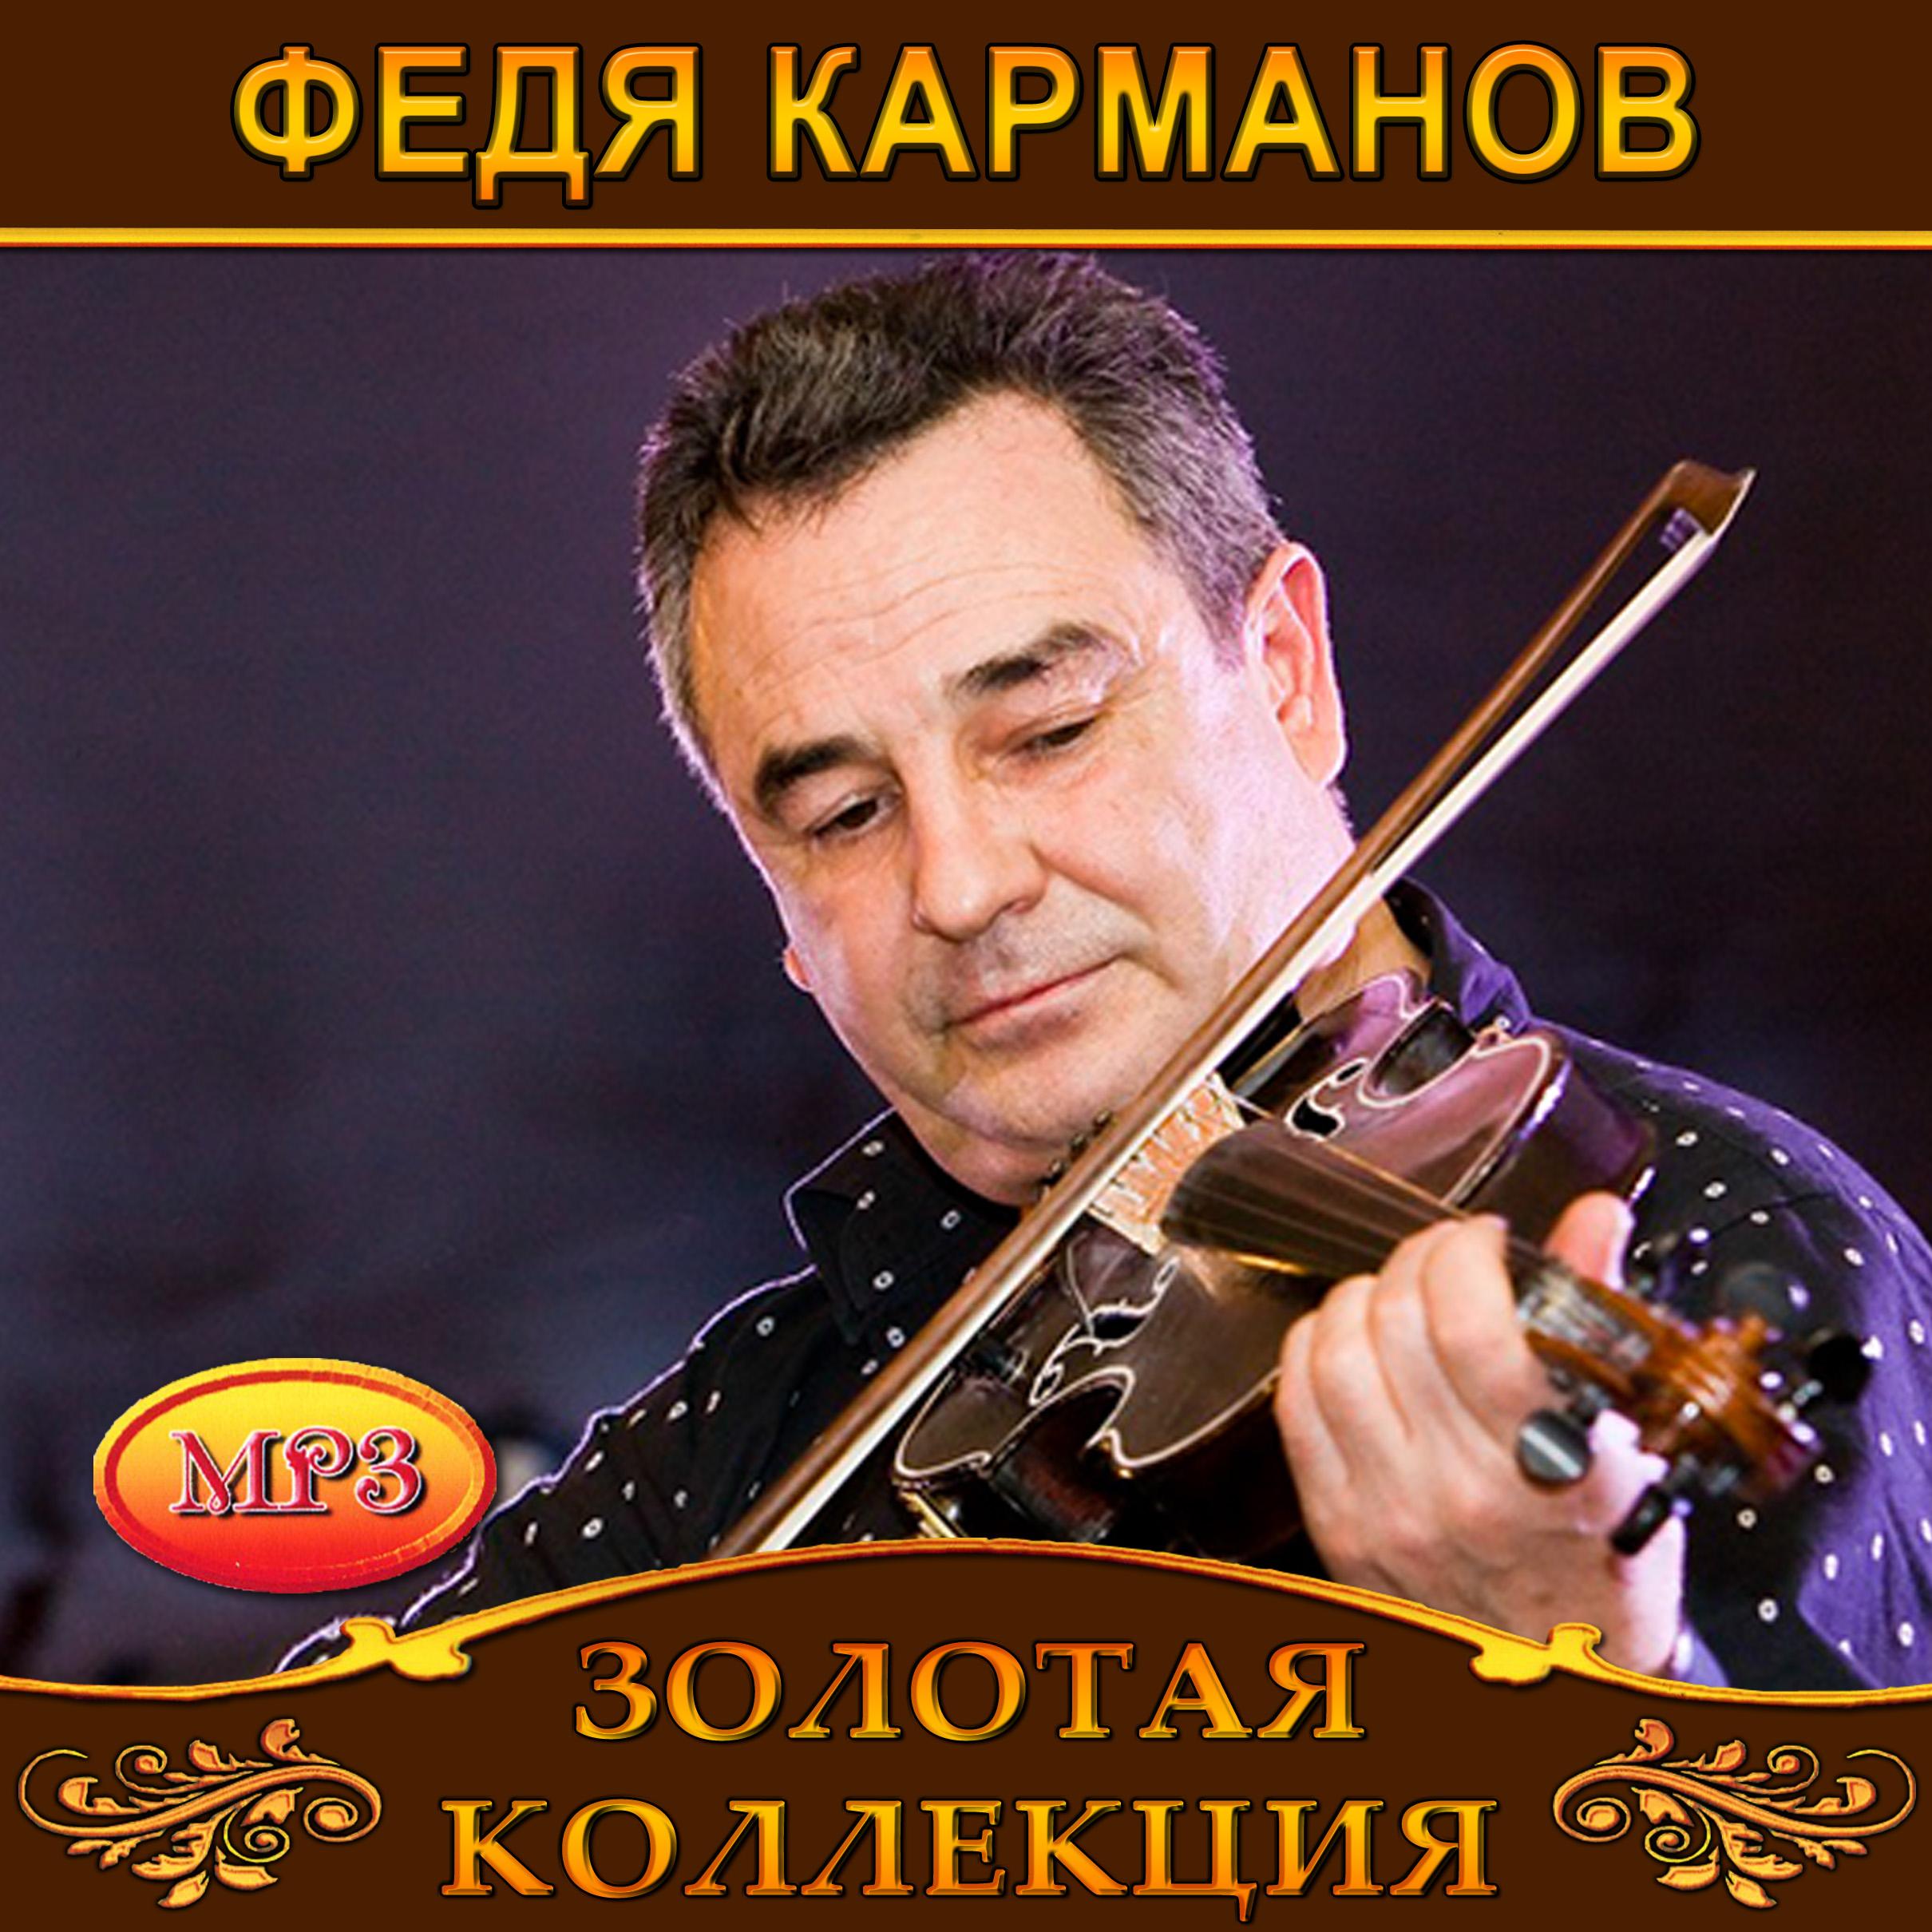 Федя Карманов [mp3]